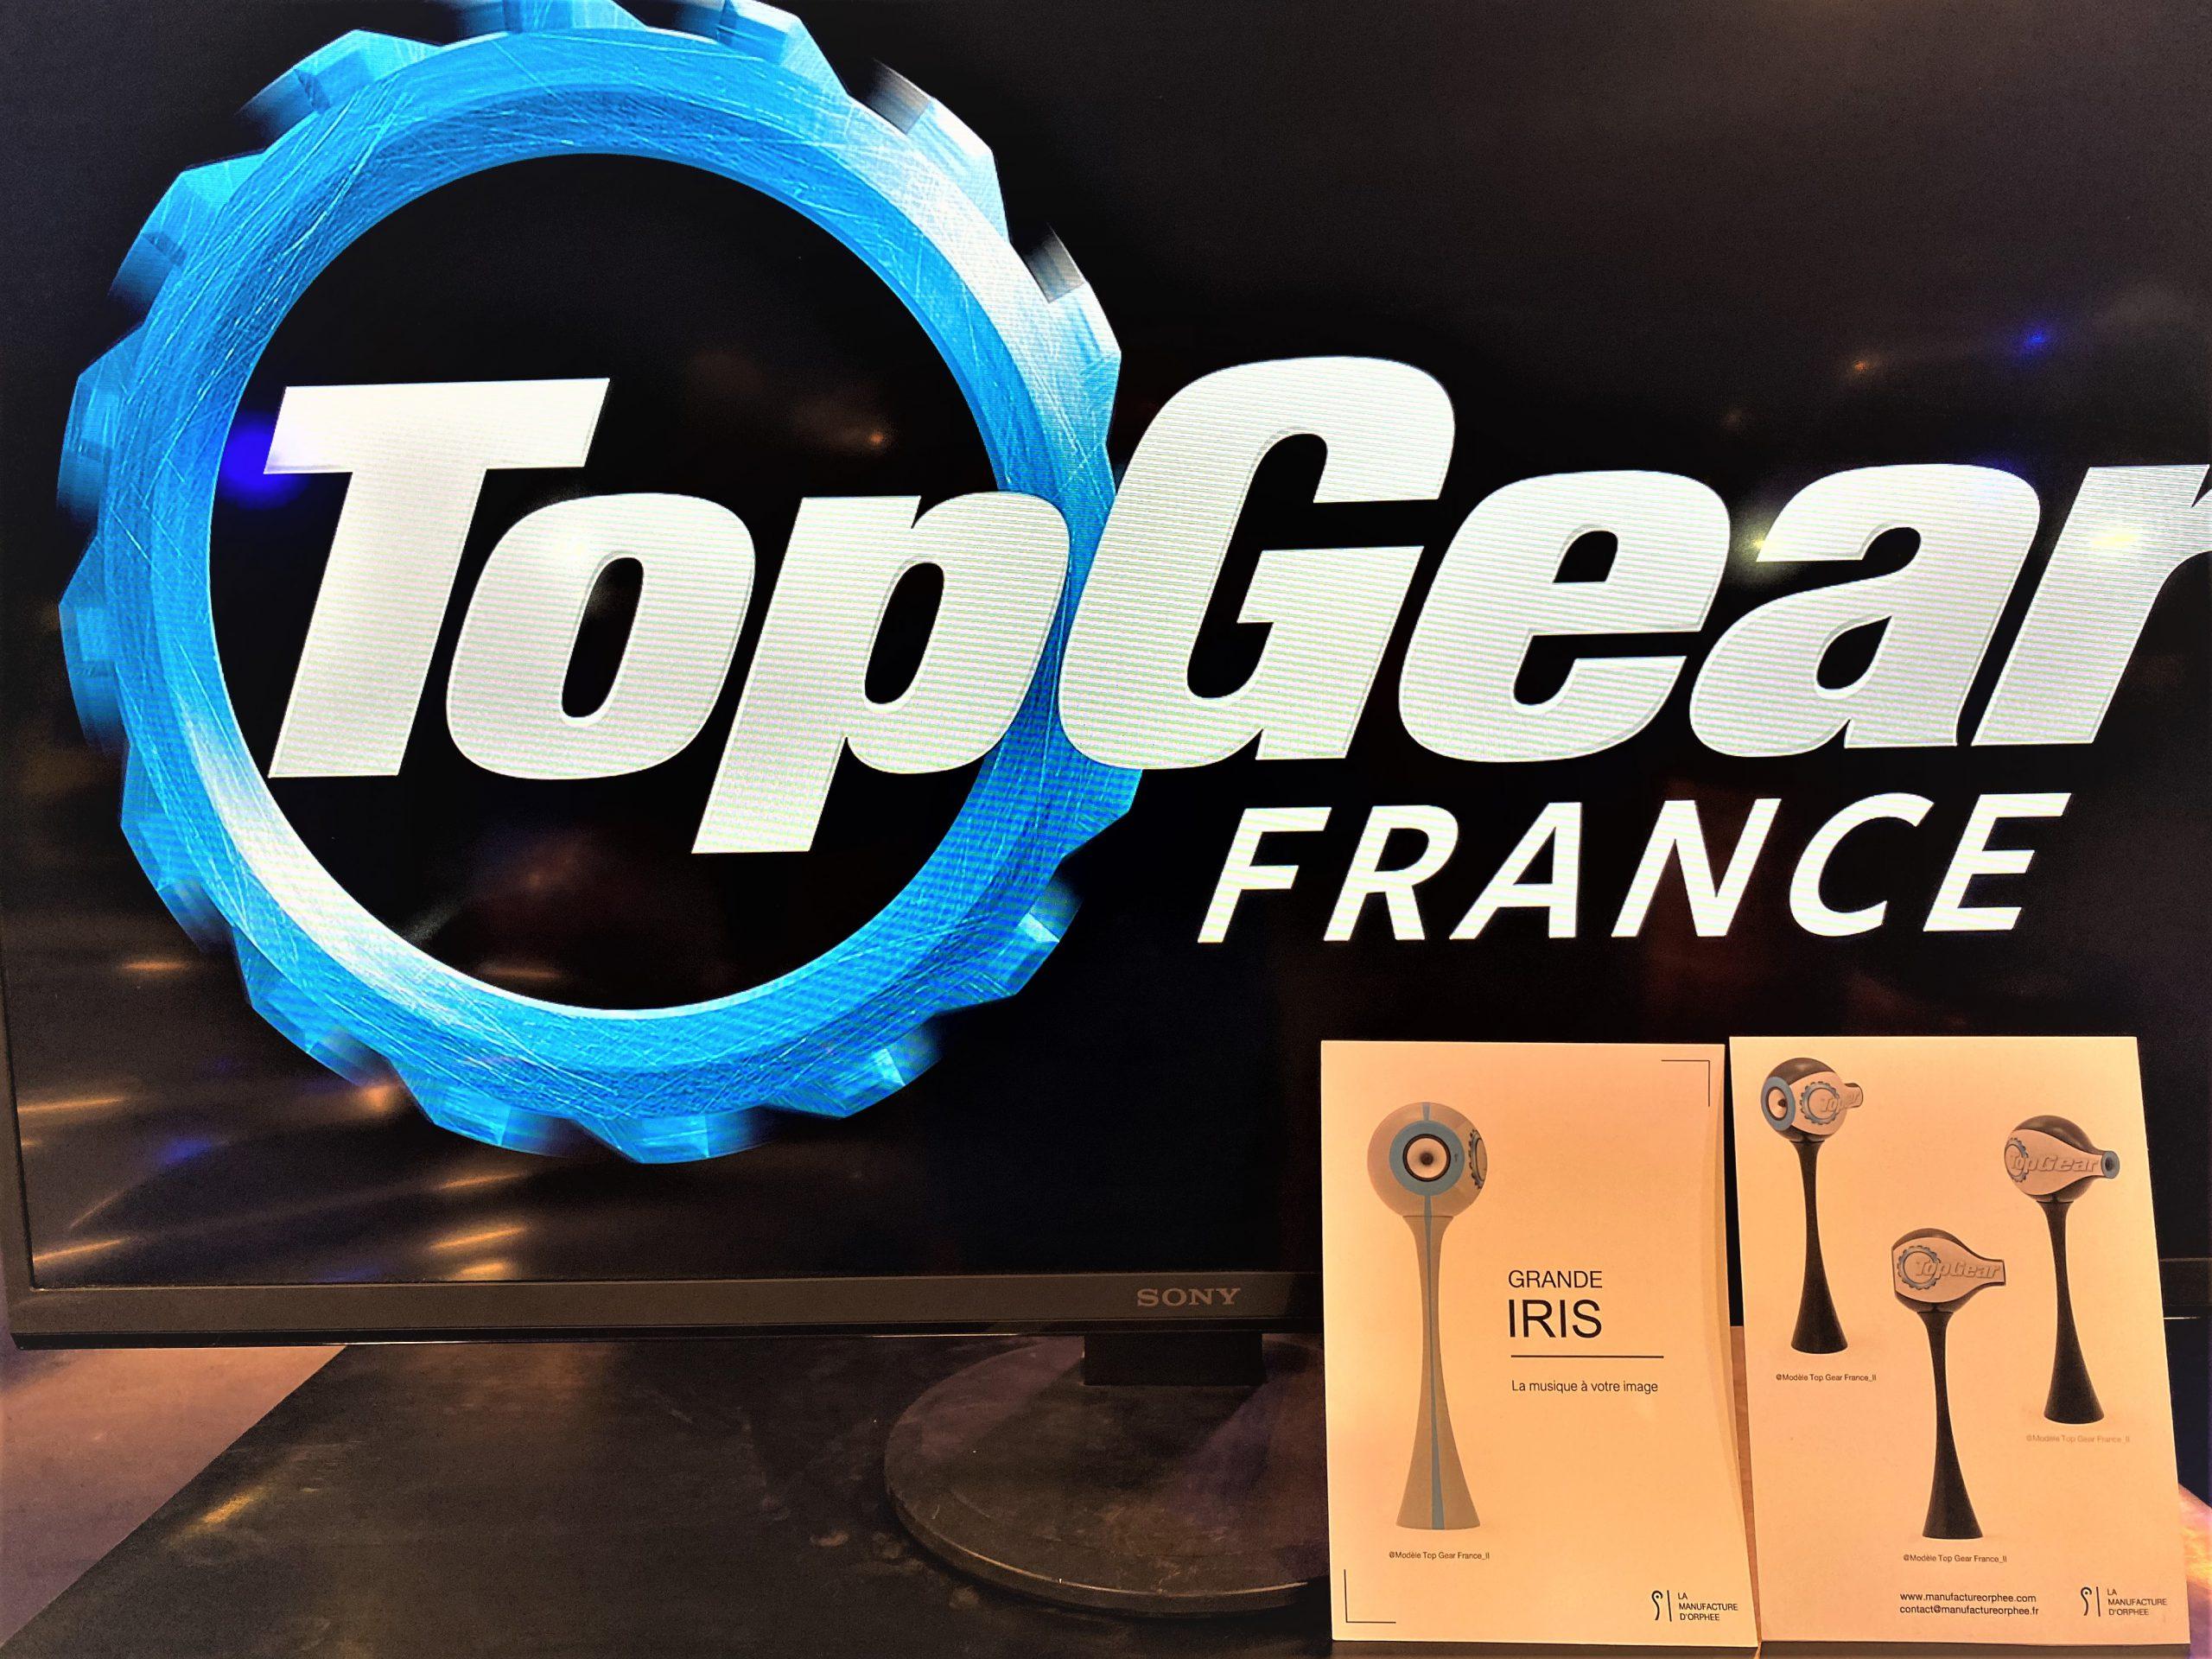 Grande Iris & TopGear FRANCE